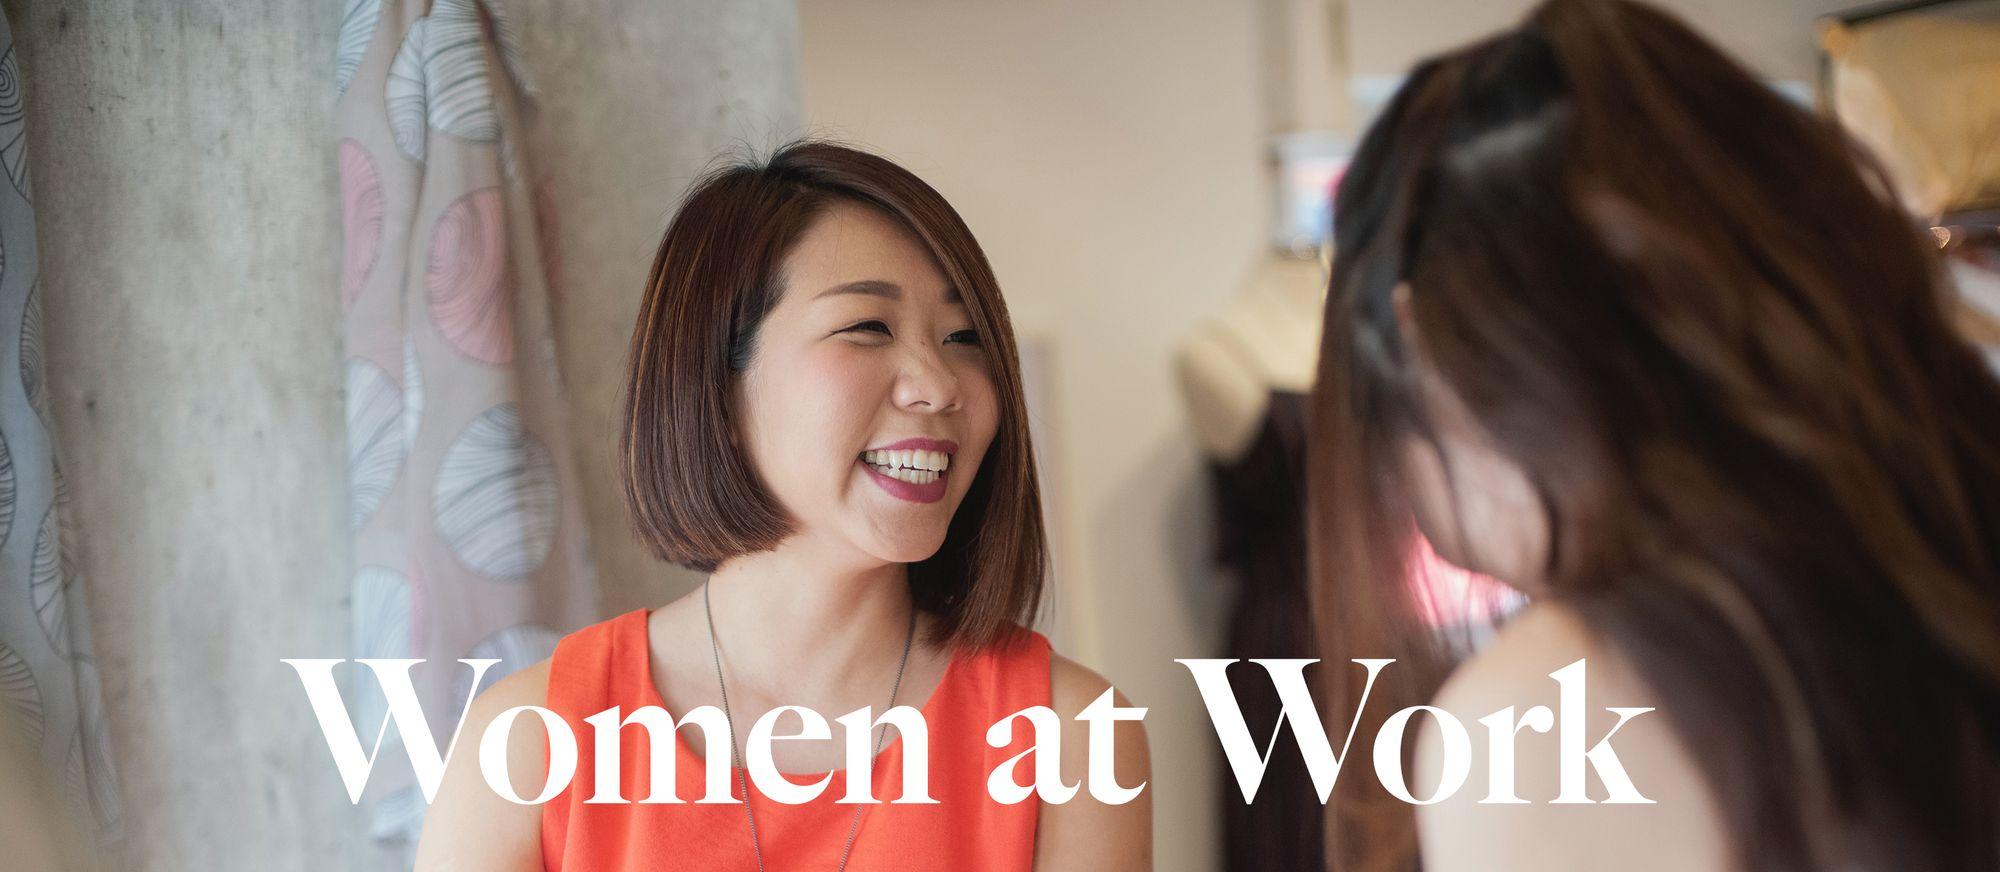 Women at Work - Edition 3